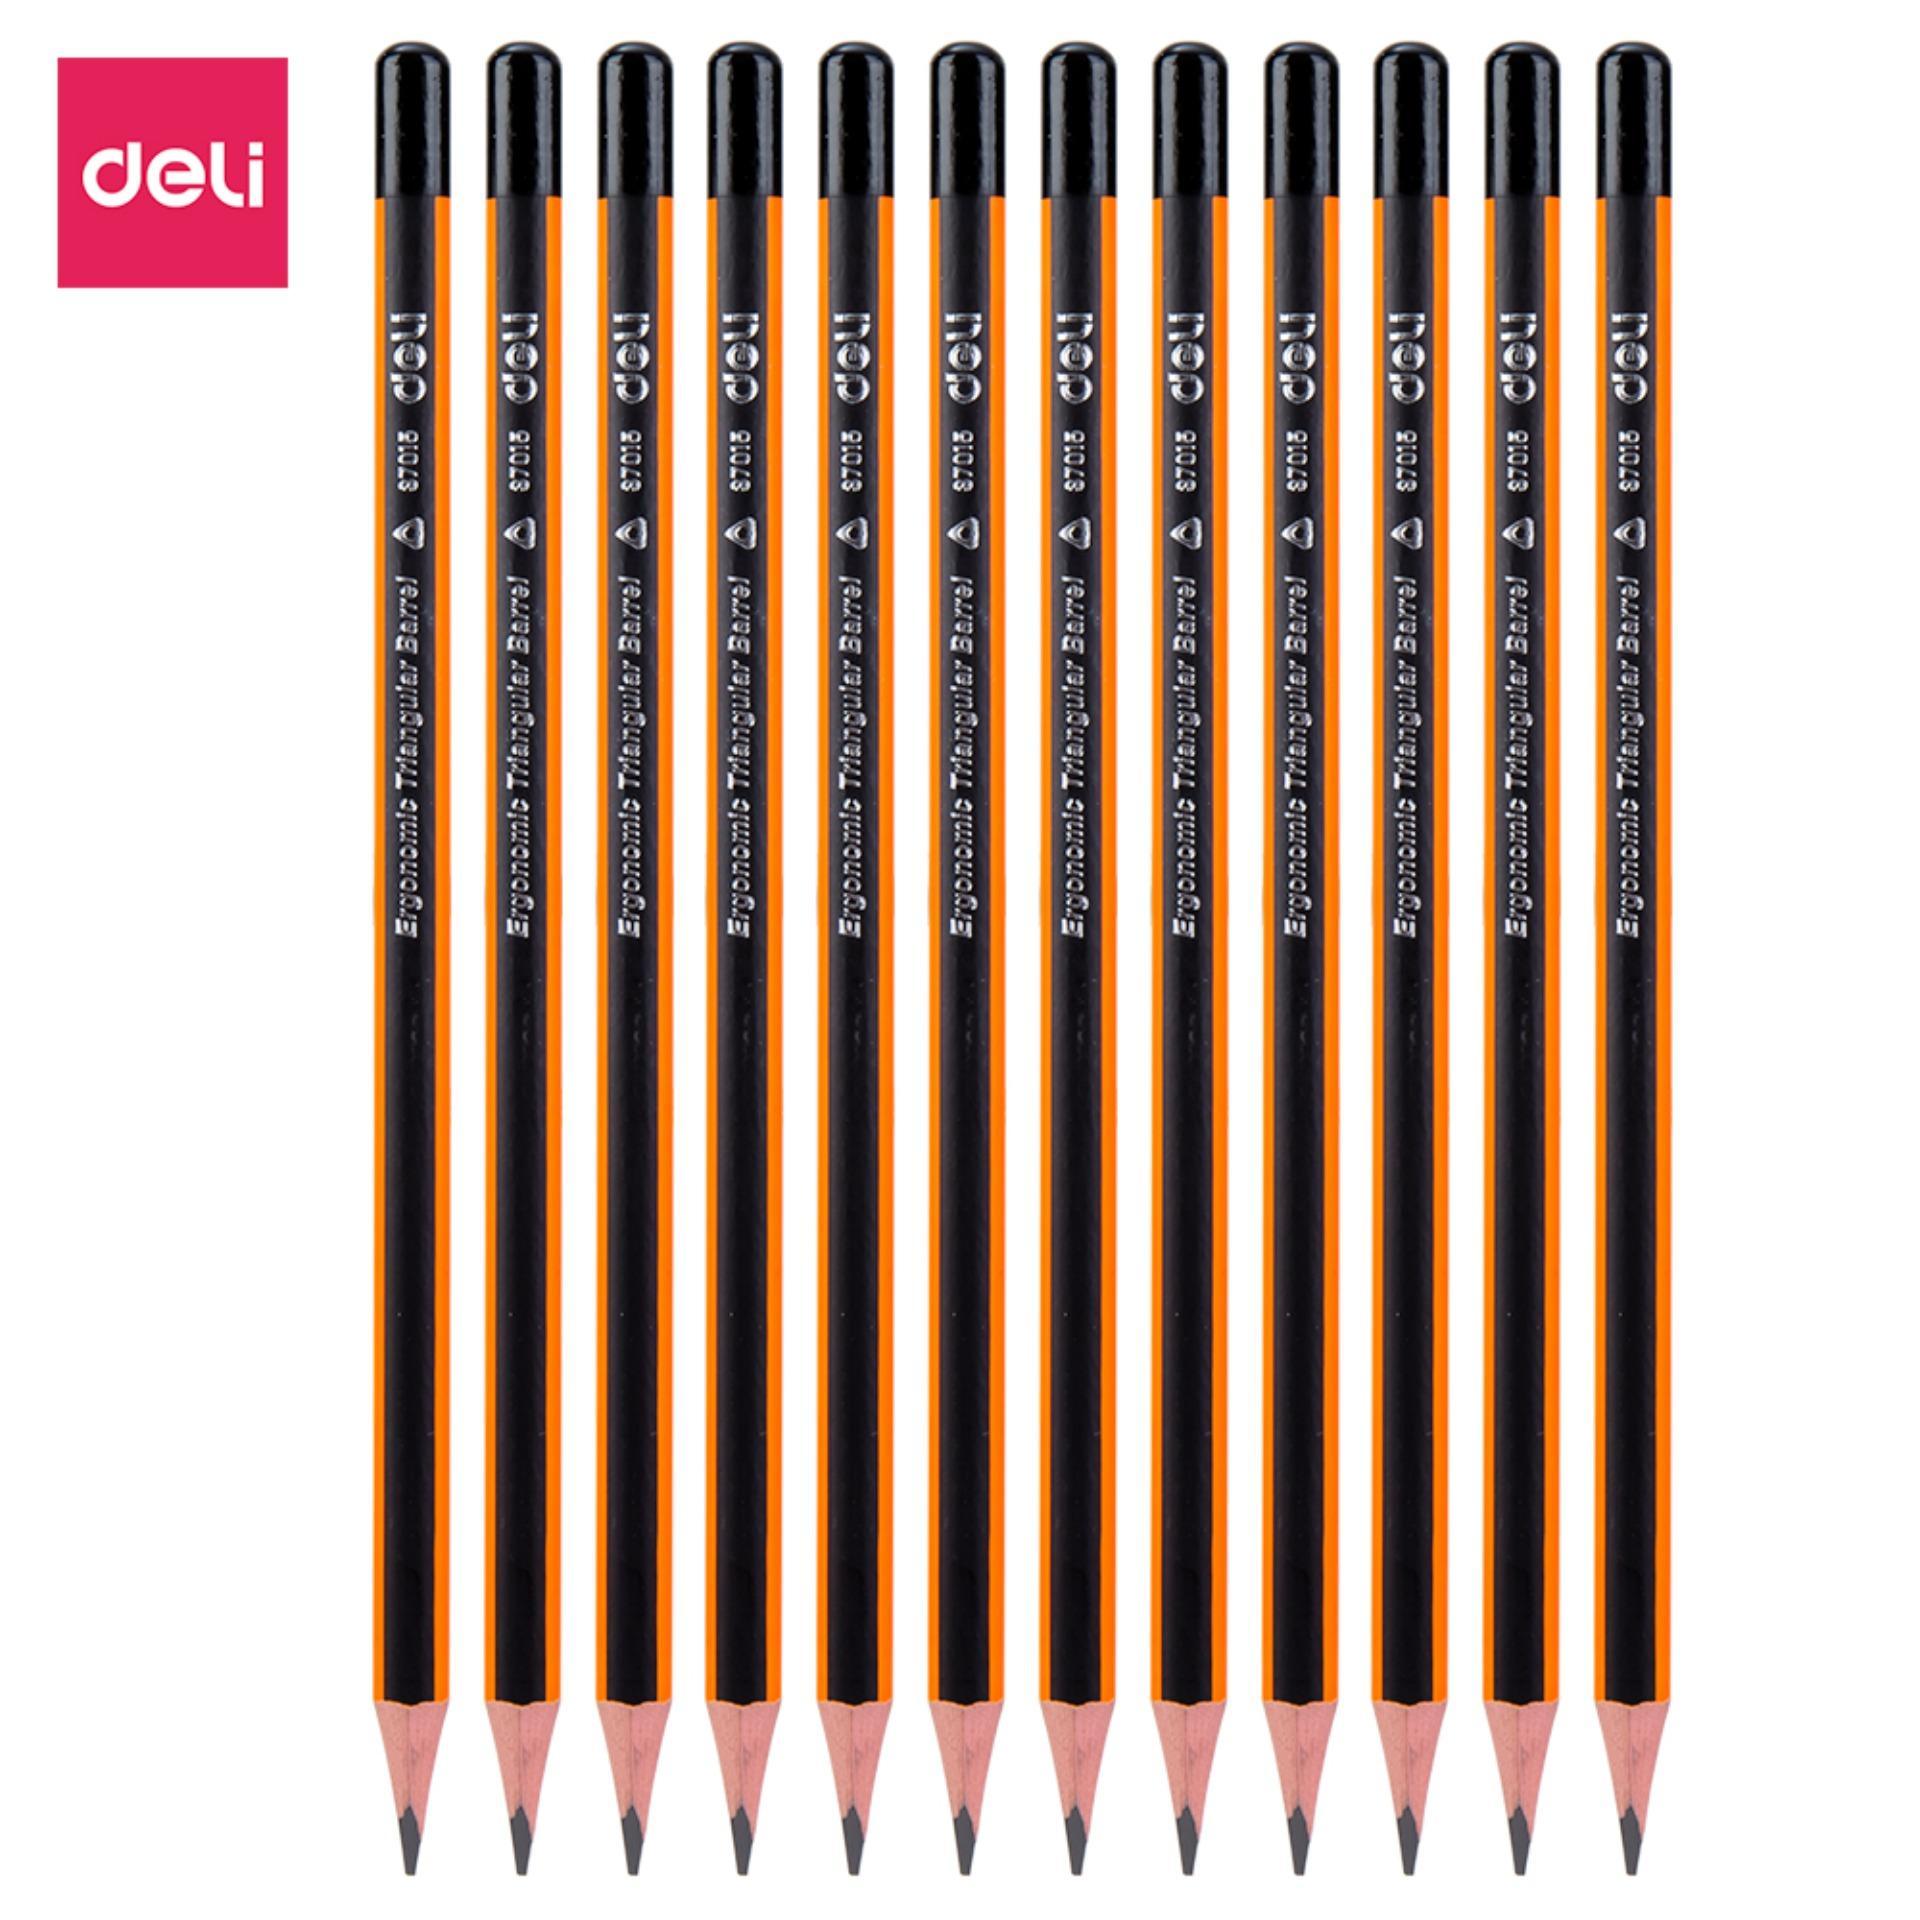 Deli Pensil Kayu / Graphite Pencil - 2B w/penghapus/eraser x 10pcs/BOX) - basswood berkualitas, bentuk ergonomis, sertifikat CE, tidak beracun / quality basswood, ergonomic shape, CE certificated, Non-toxic (E37015)